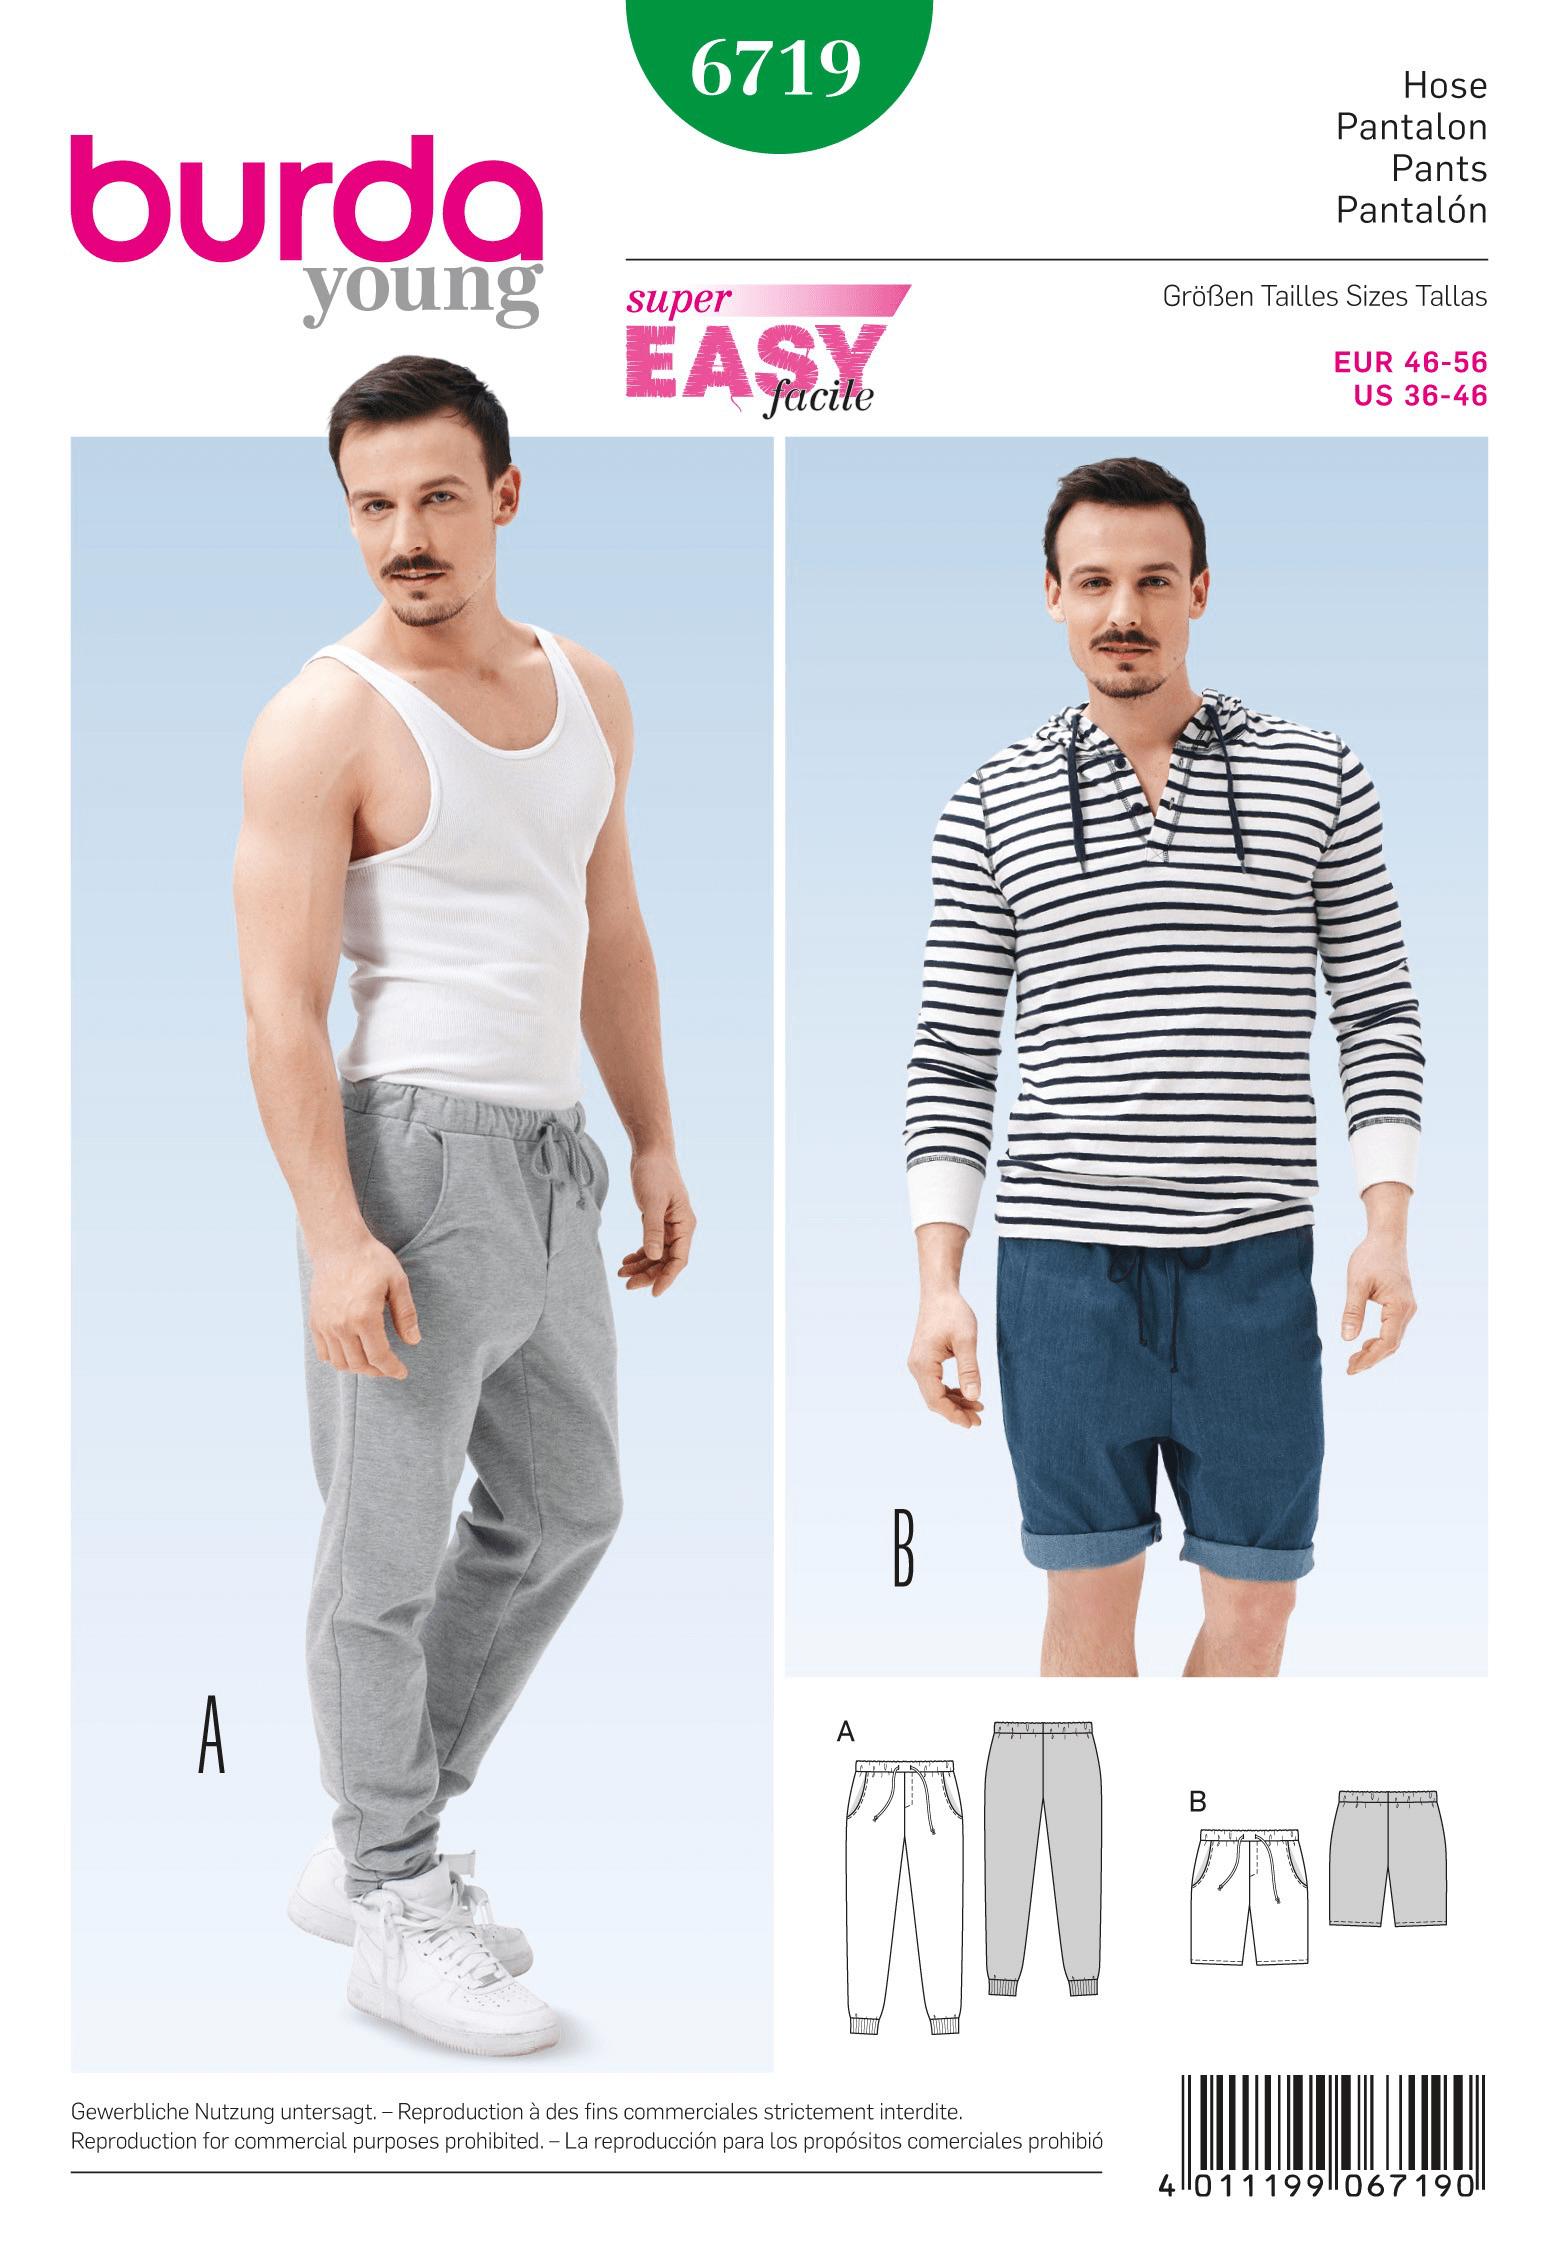 Burda Mens Jogging Trousers Casual Fabric Sewing Pattern 6719